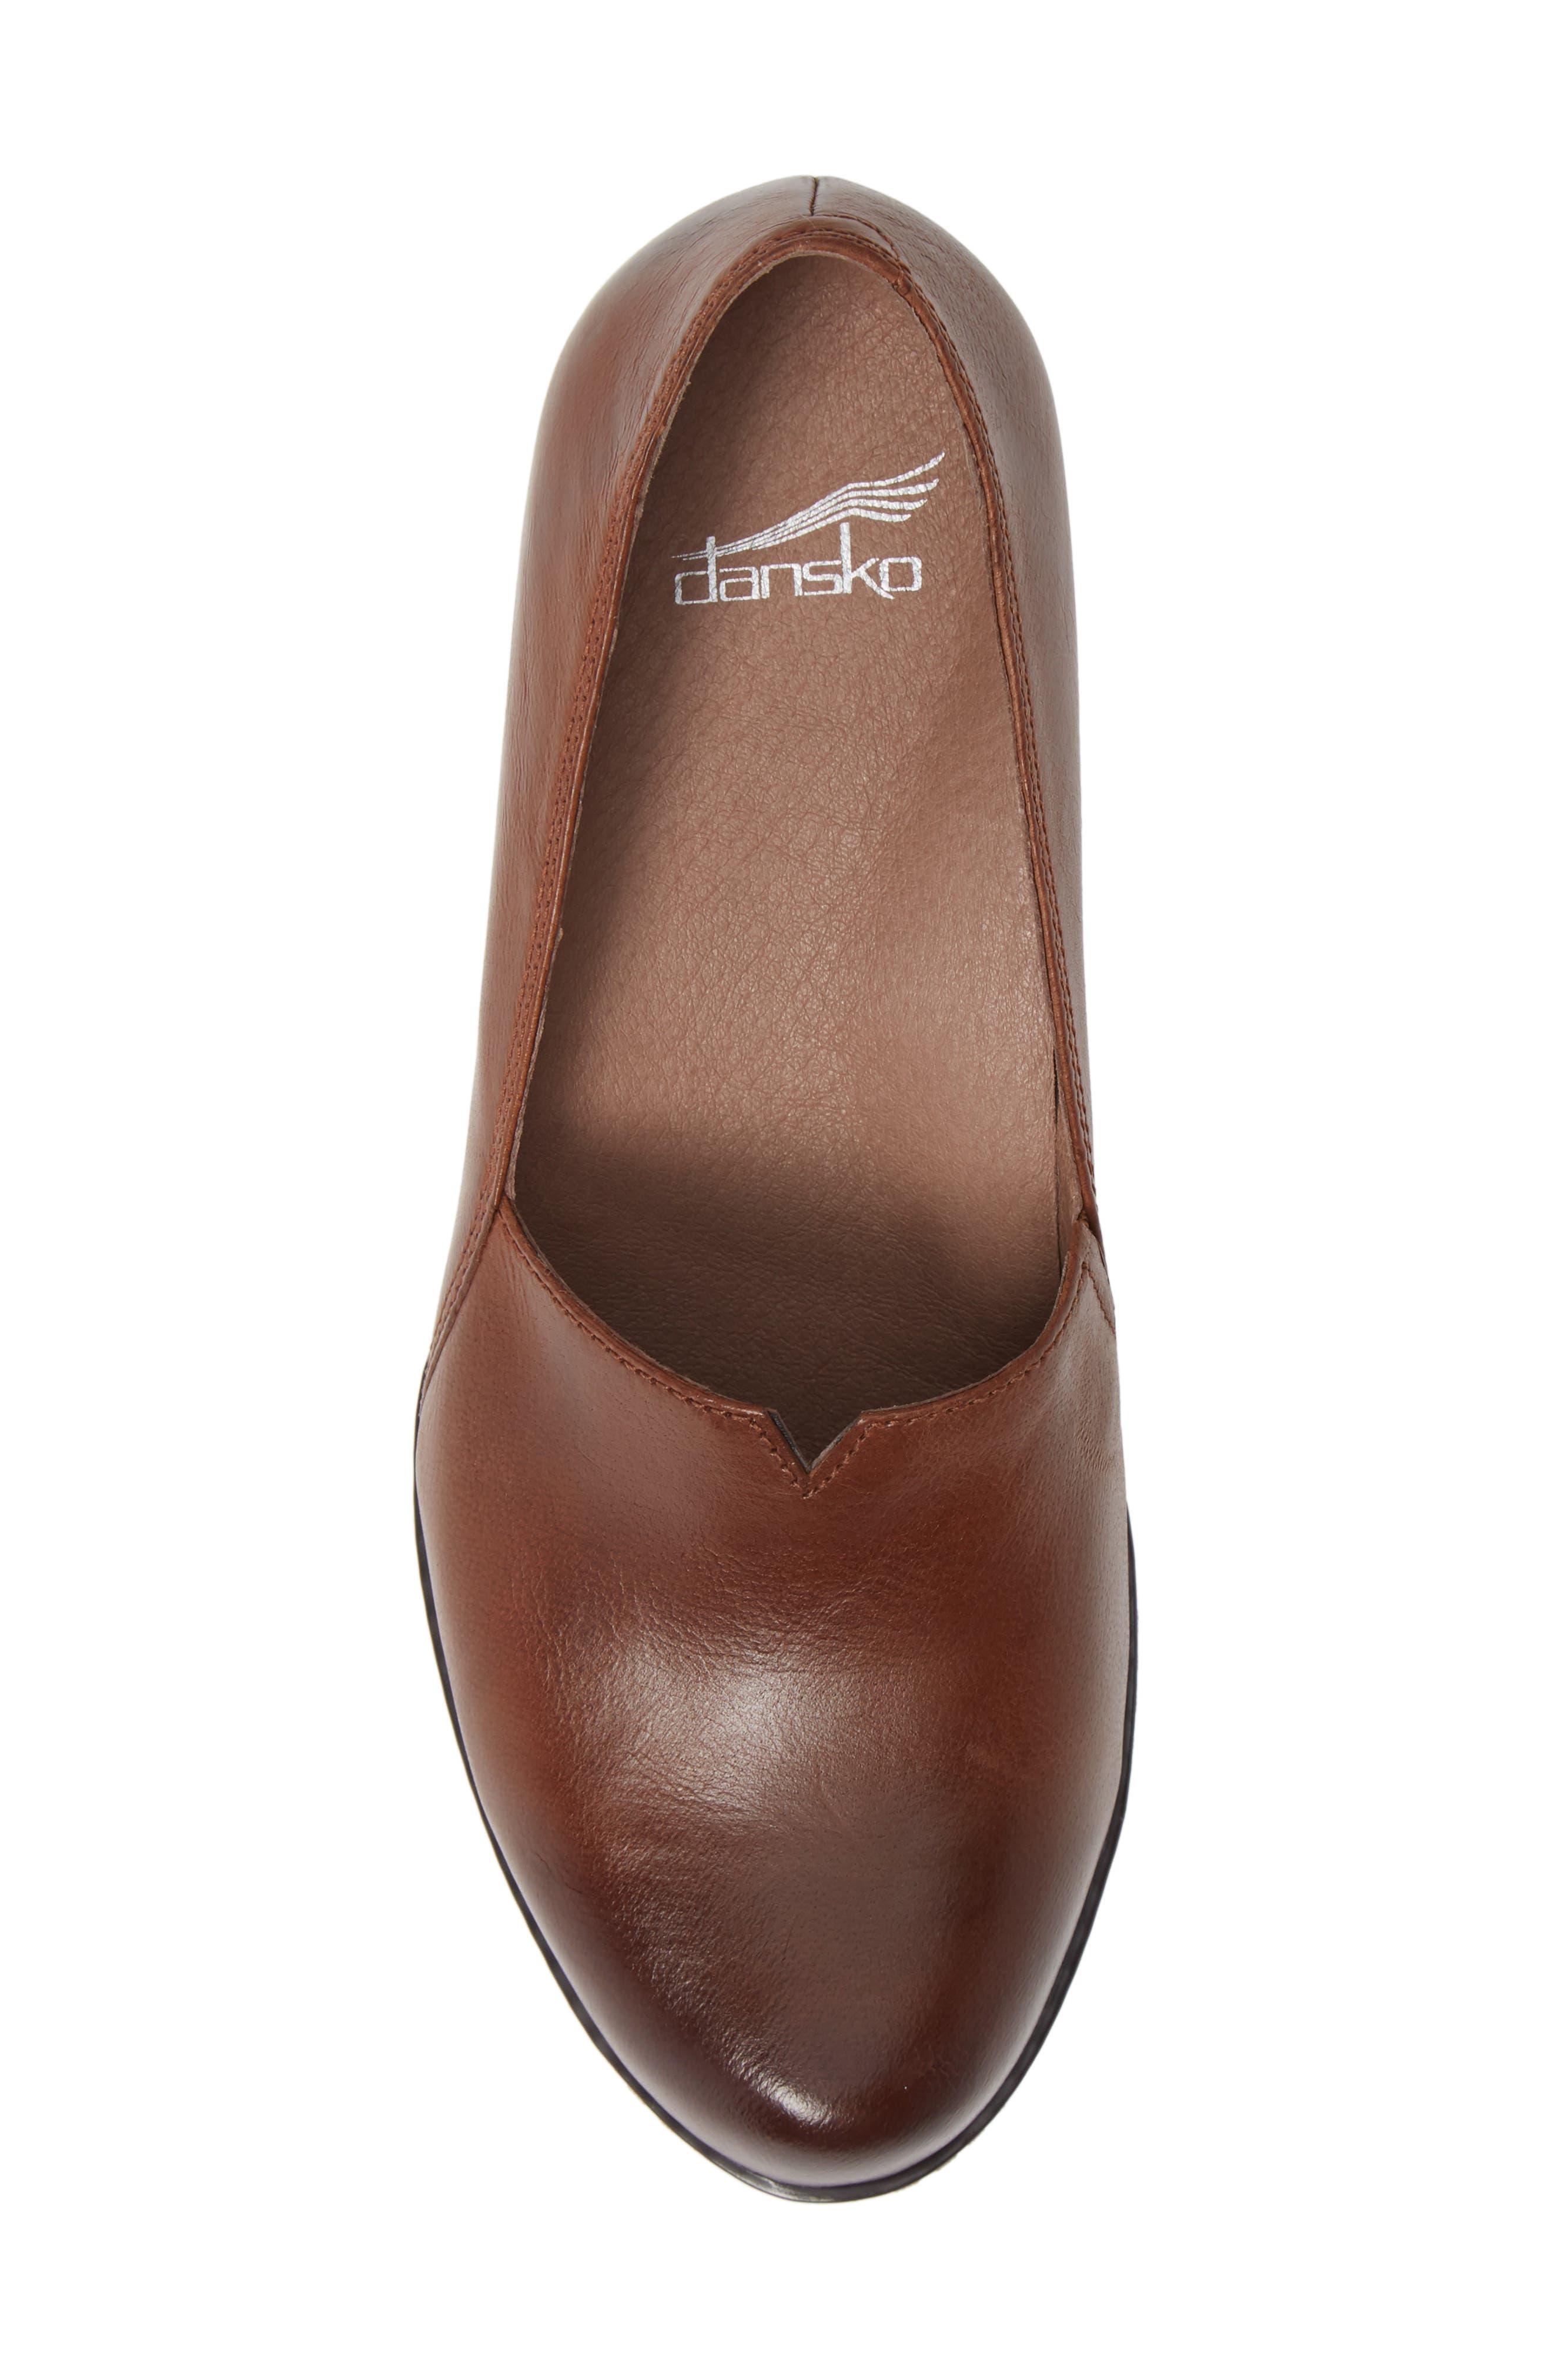 Liliana Concealed Wedge Slip-On,                             Alternate thumbnail 3, color,                             Chestnut Burnished Leather